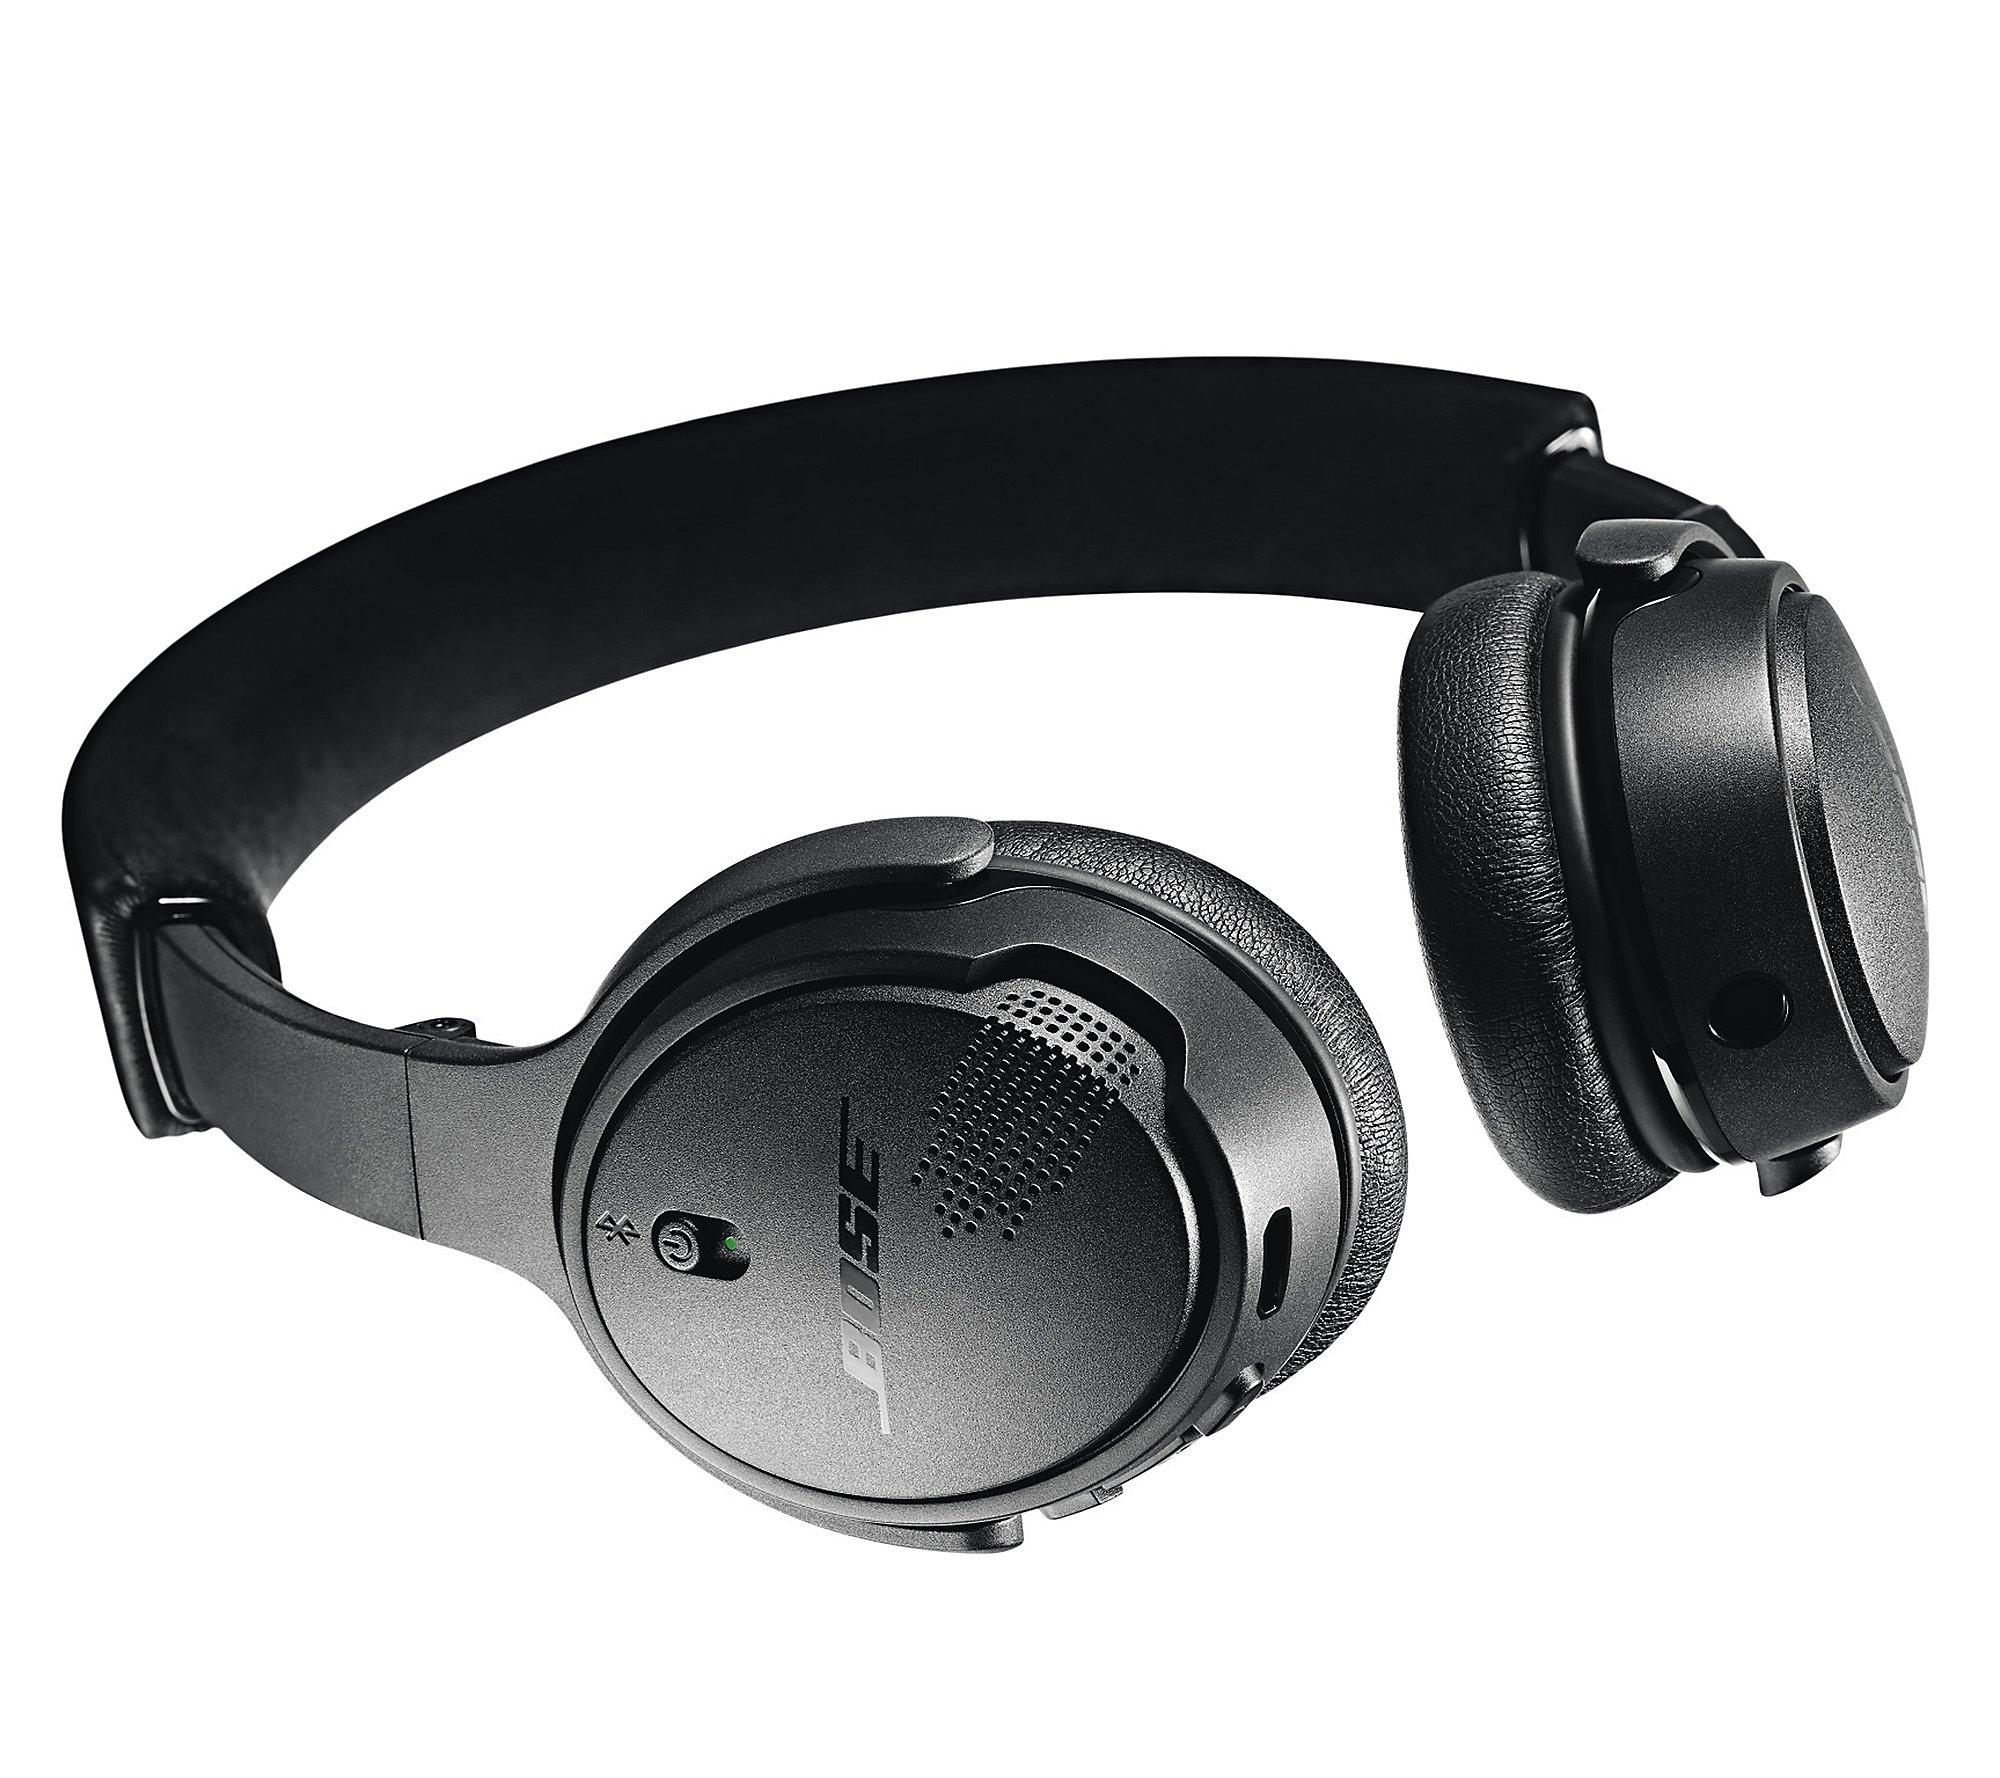 Bose On Ear Wireless Bluetooth Headphones Qvc Com